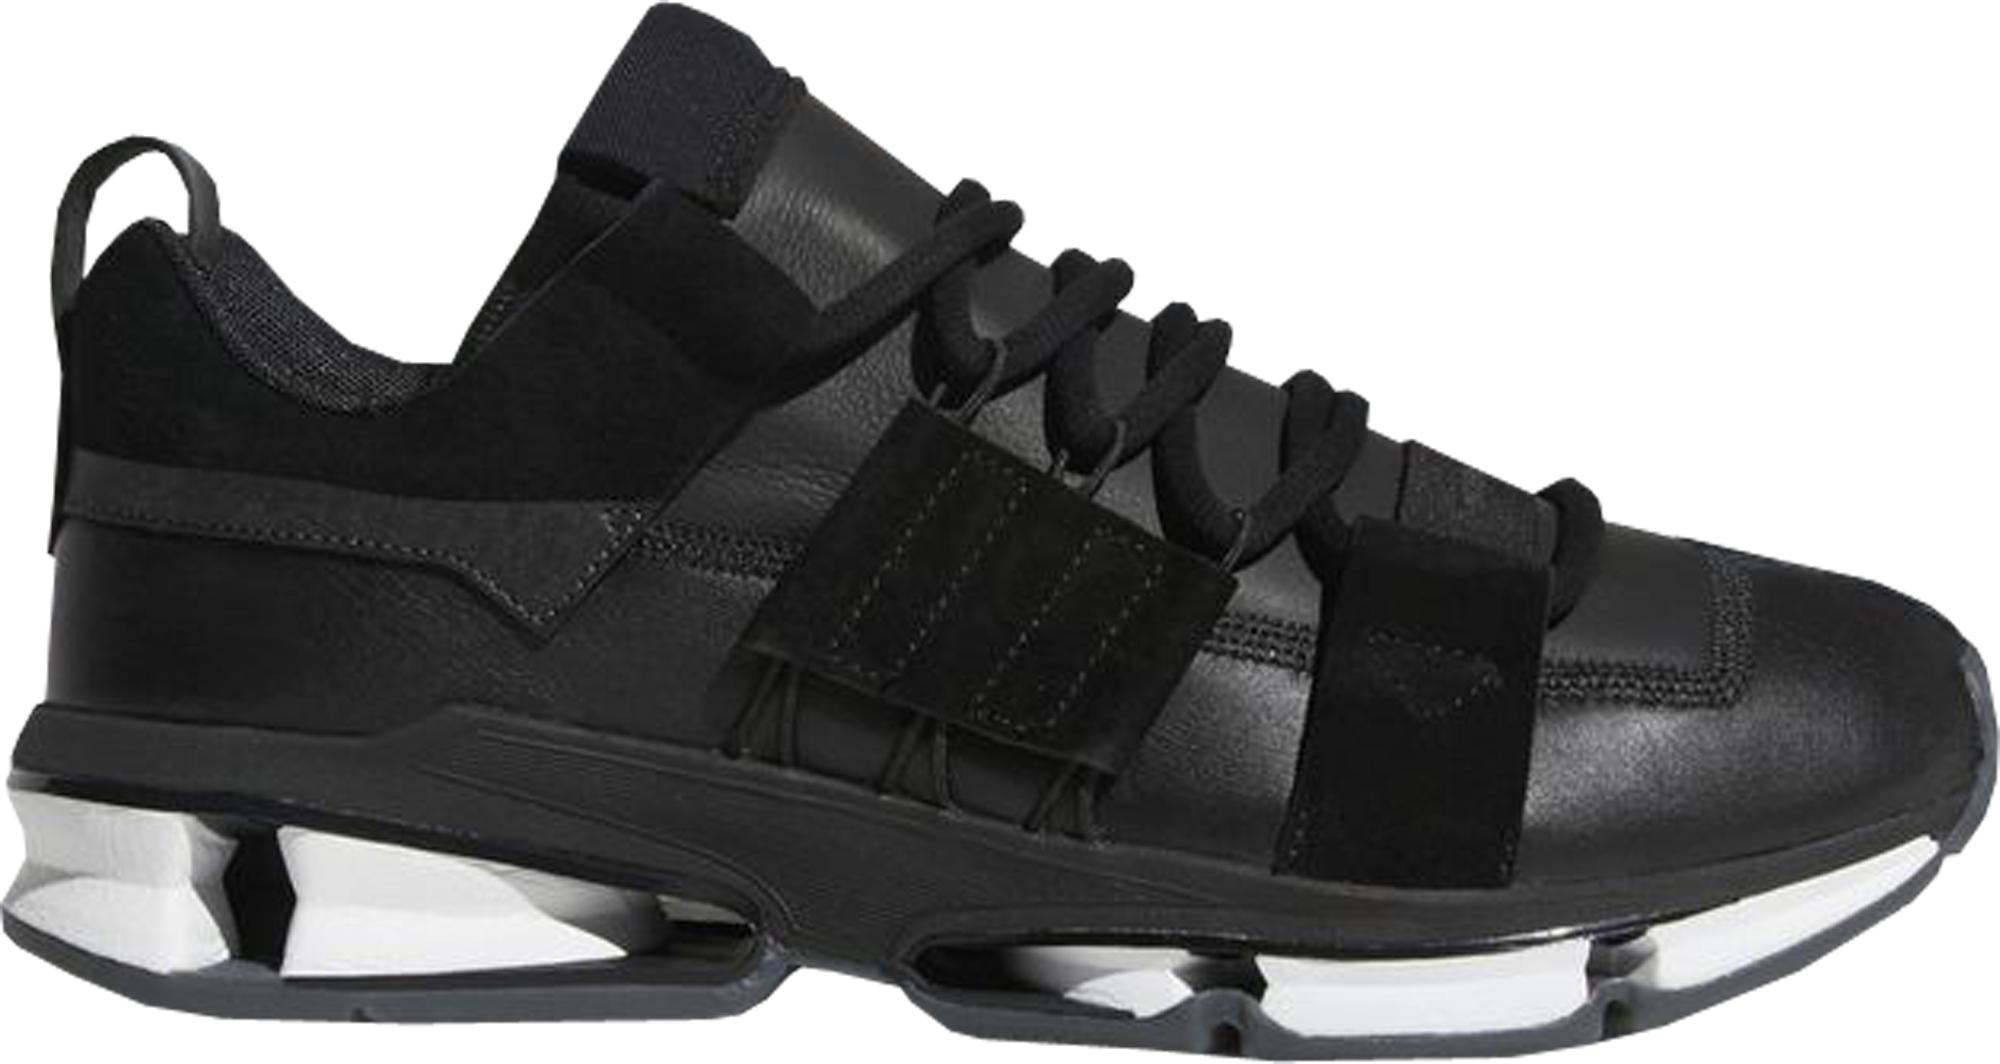 adidas Twinstrike Adv Stretch Leather Black White